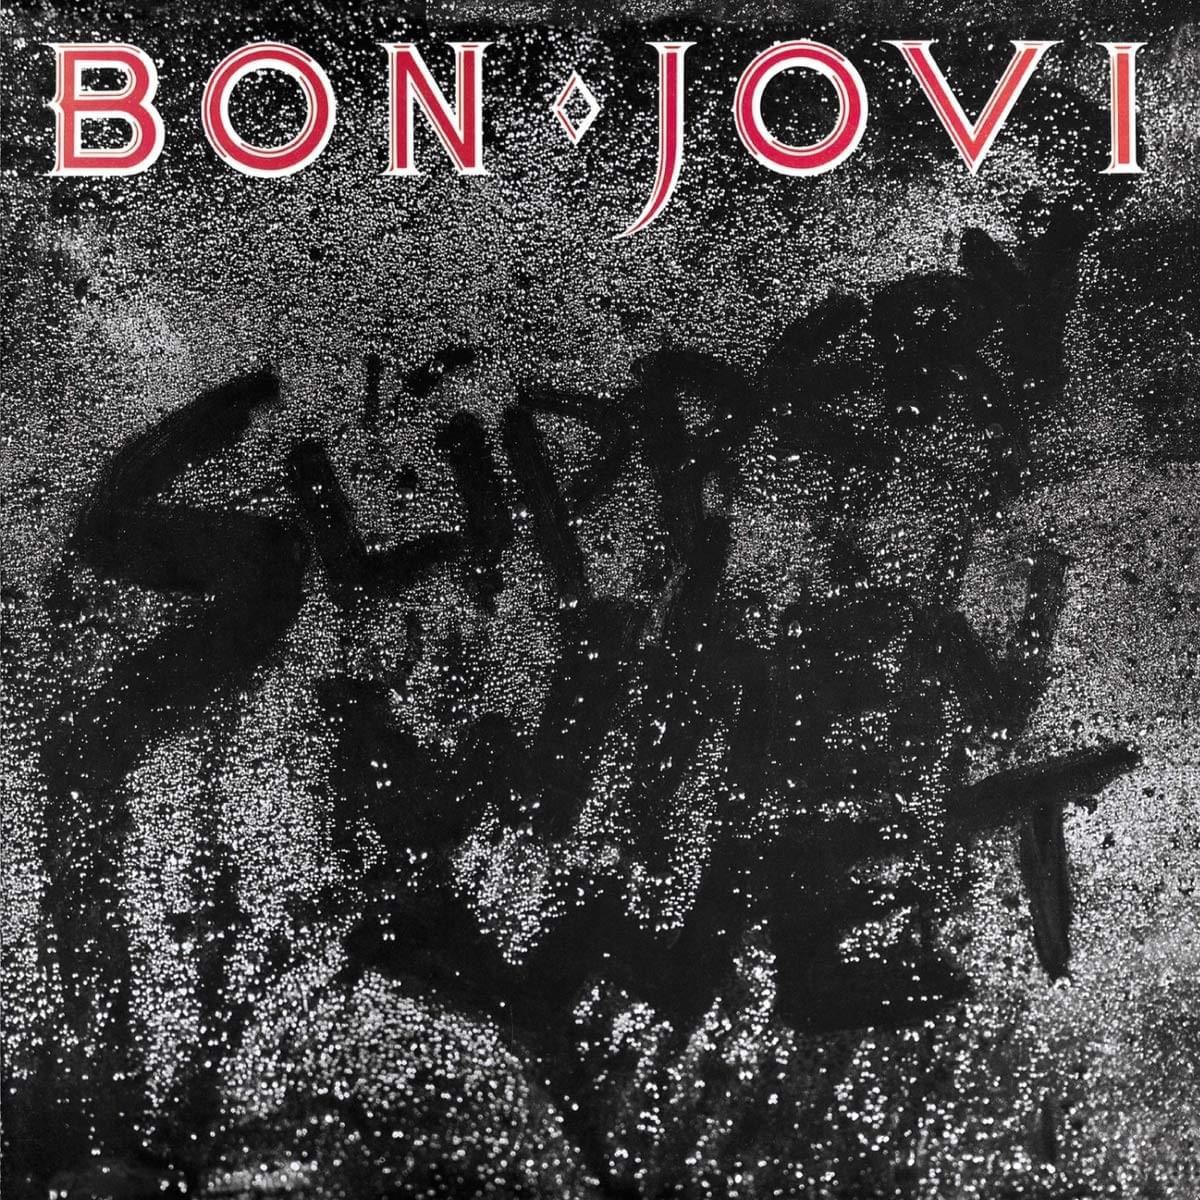 20 Albums, 20 Days: Slippery When Wet